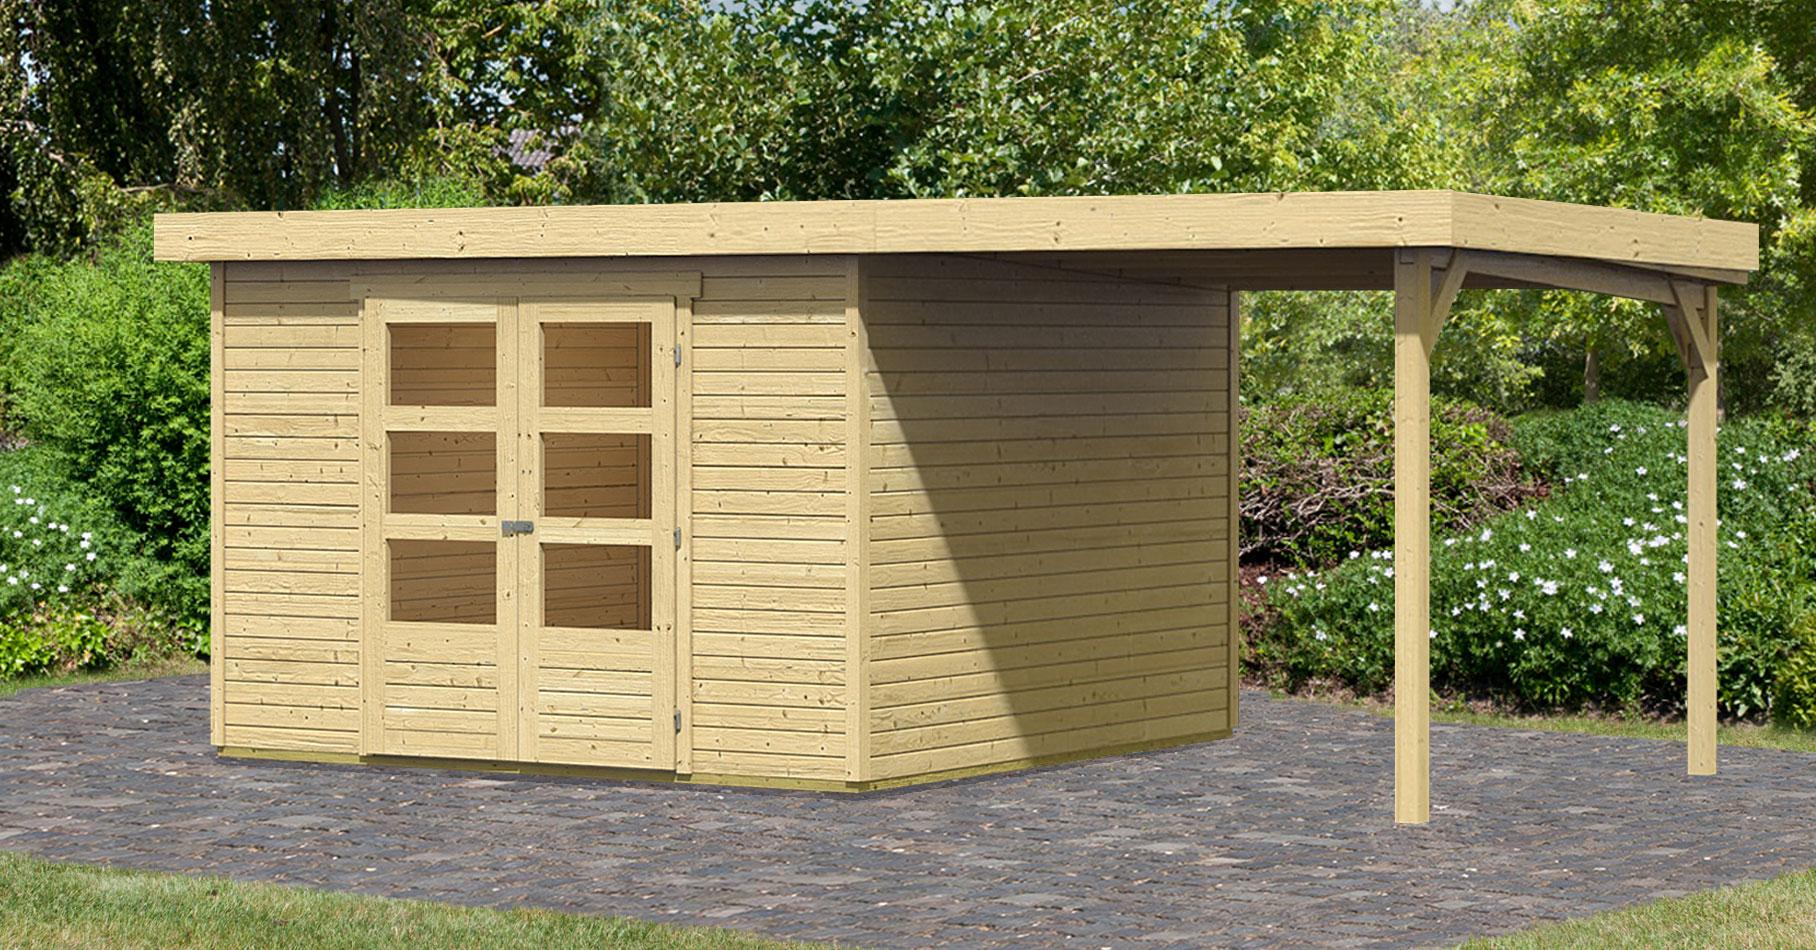 woodfeeling gartenhaus 19mm askola 5 natur 329x262cm schleppdach bei. Black Bedroom Furniture Sets. Home Design Ideas